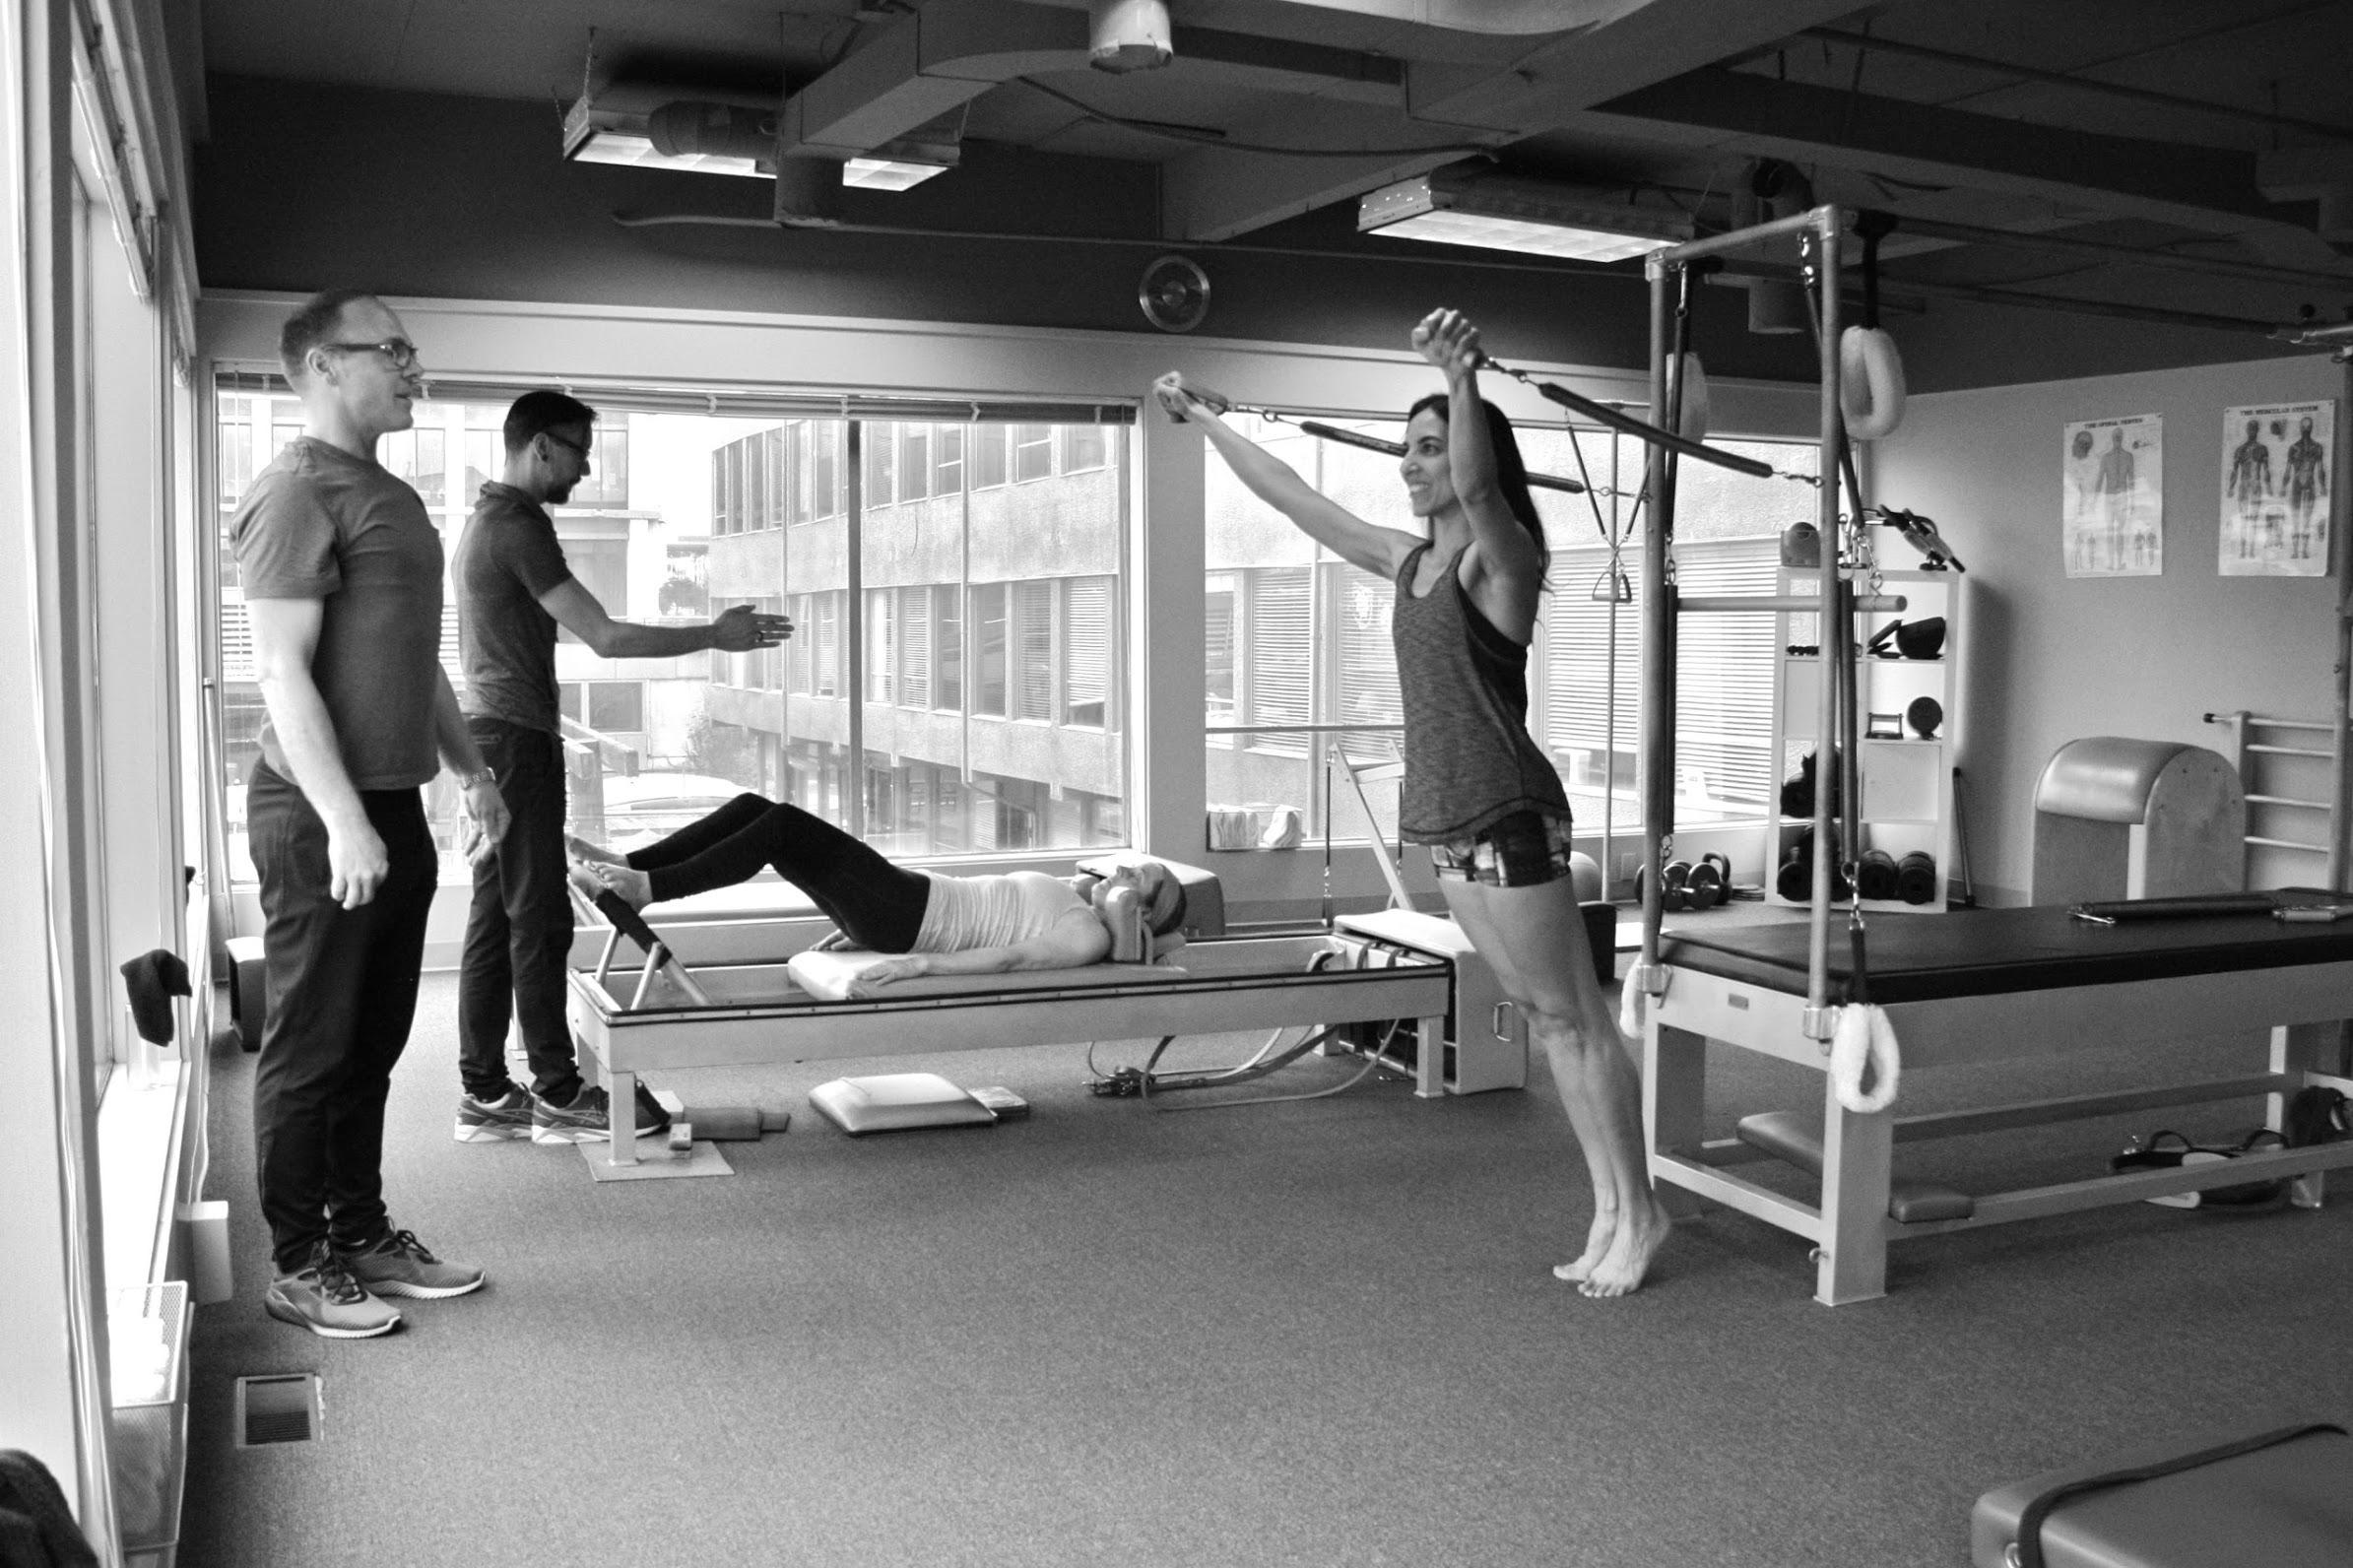 studiojacks-south-lake-union-pilates-workouts